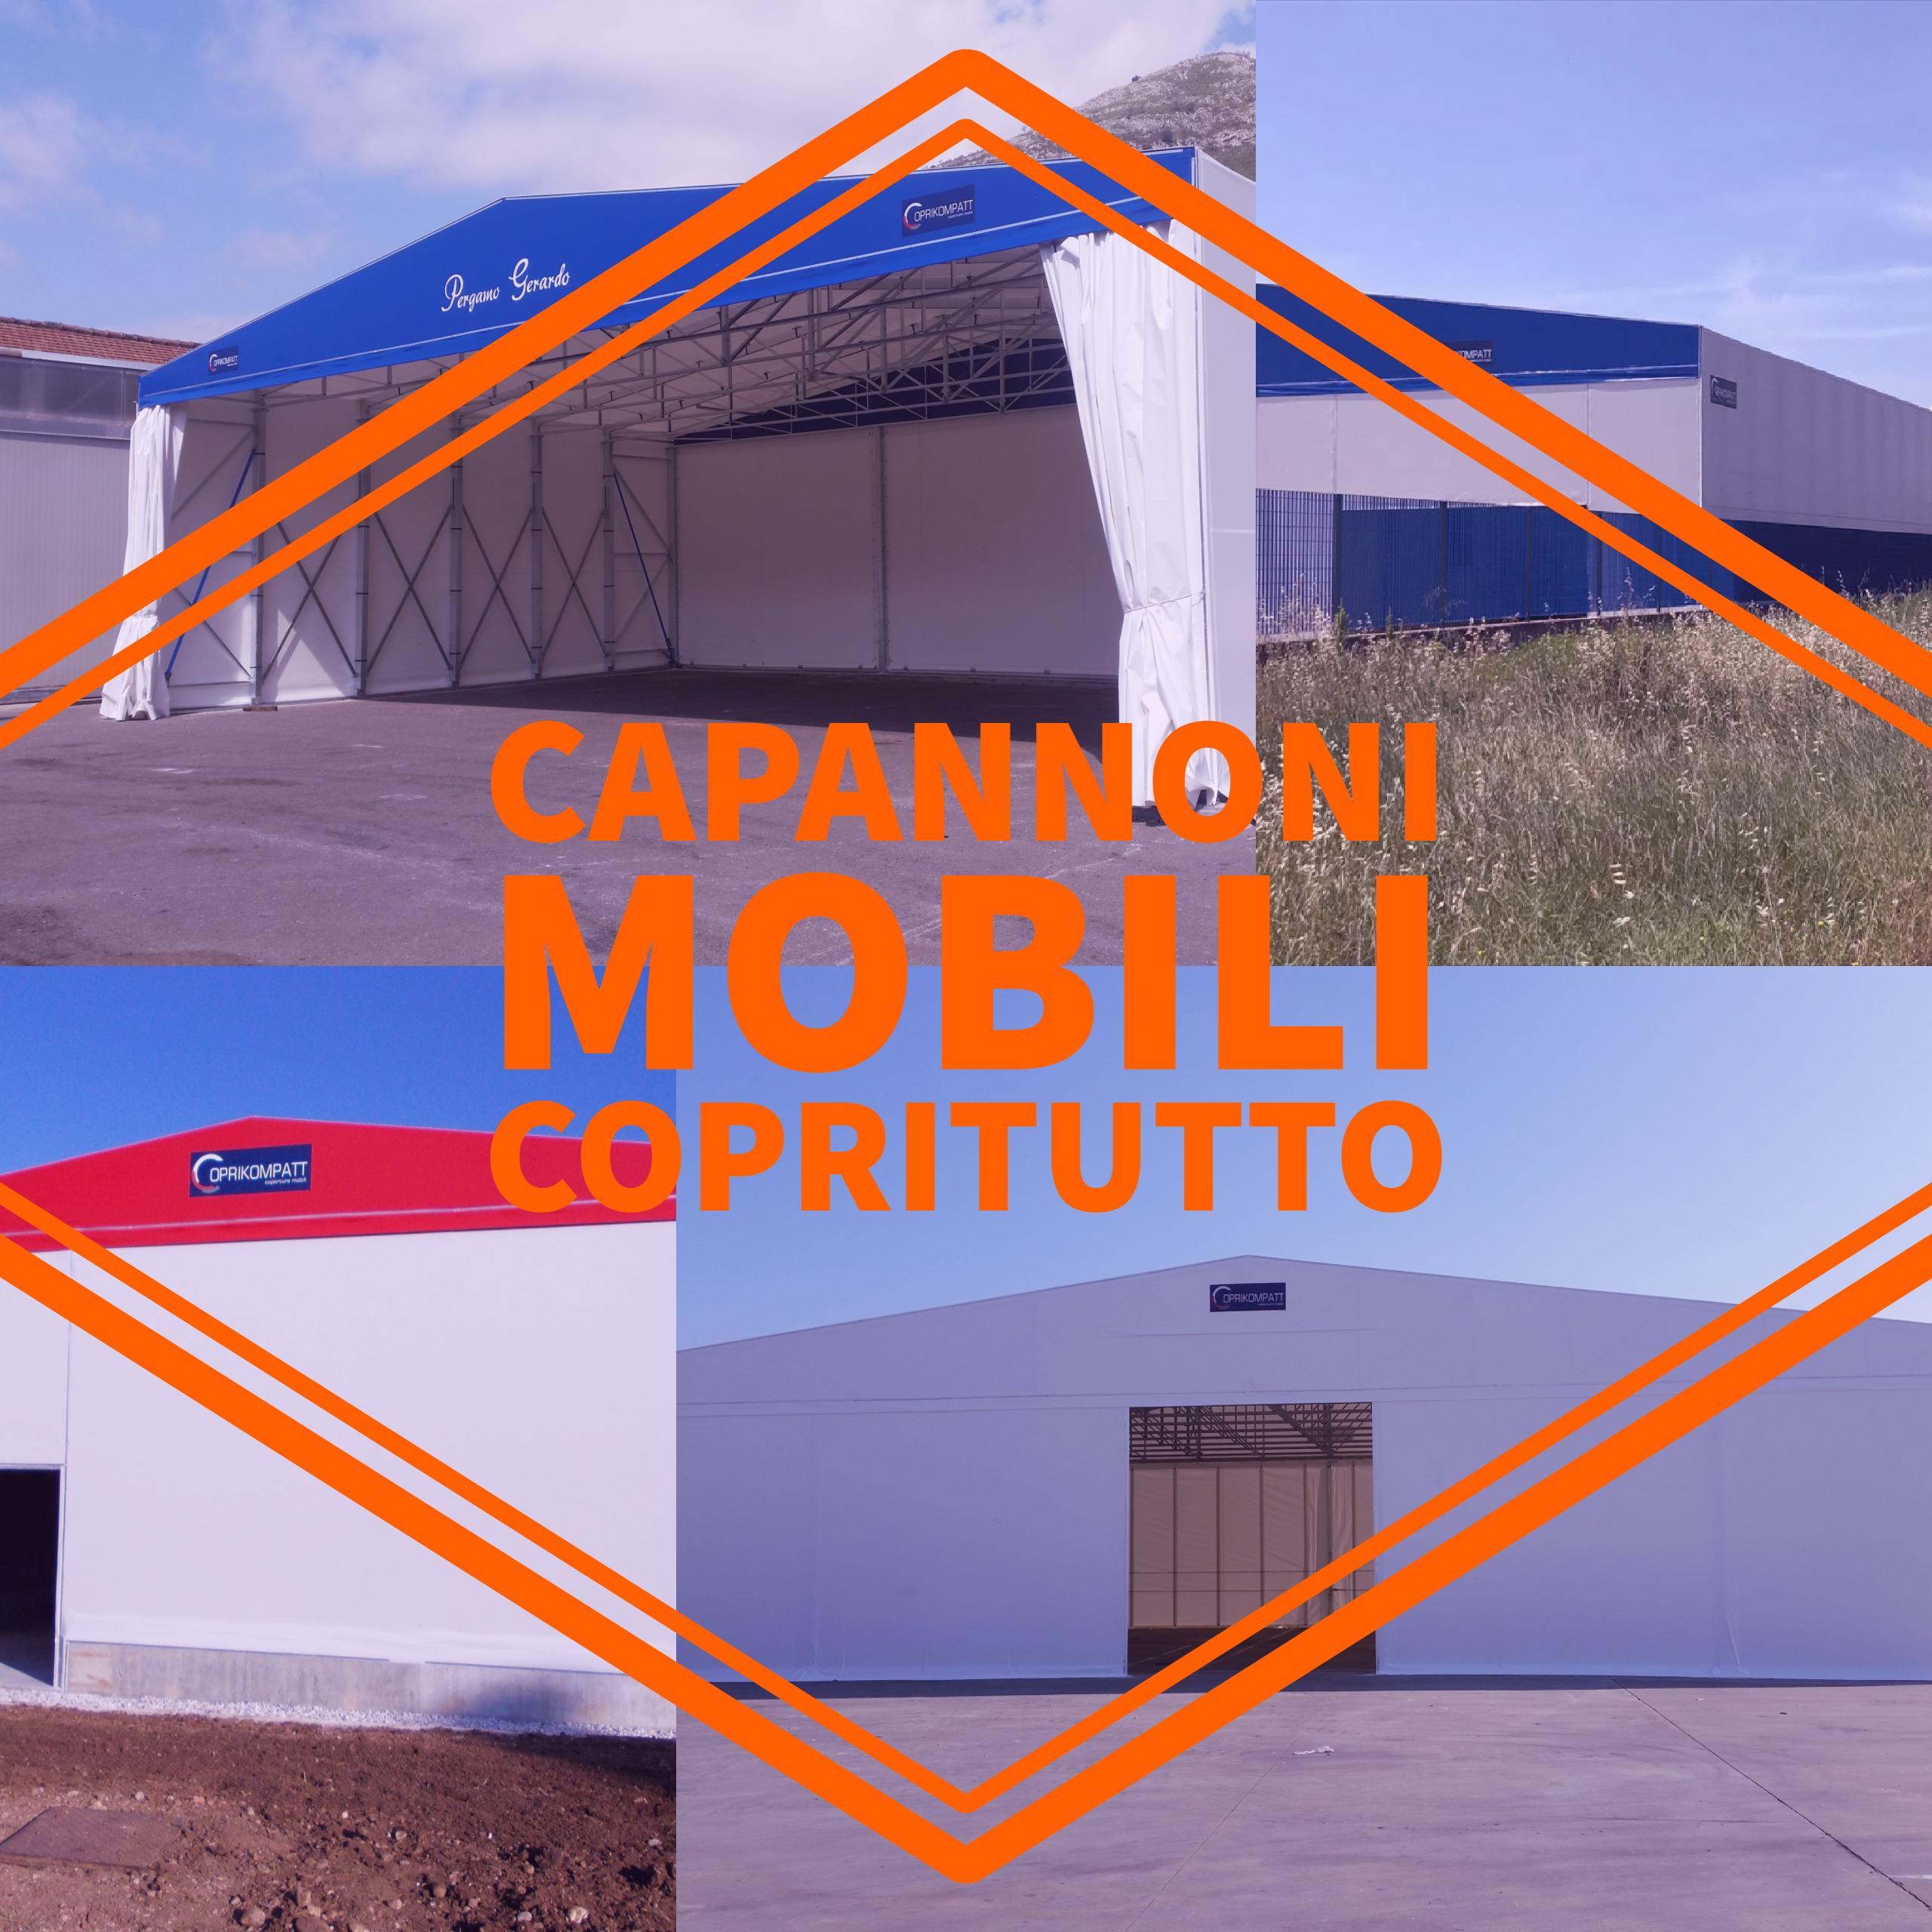 Capannoni mobili in telo pvc by capannoni mobili piemonte for 0039 mobili